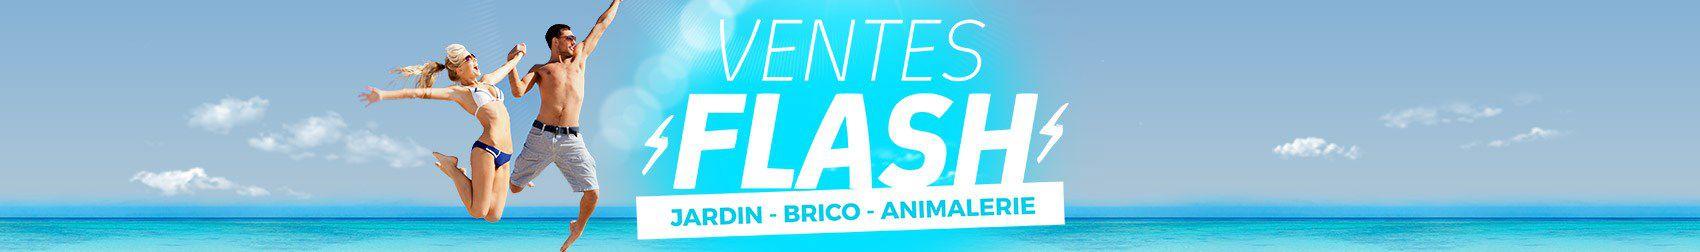 Ventes Flash Jardin   Brico   Animalerie